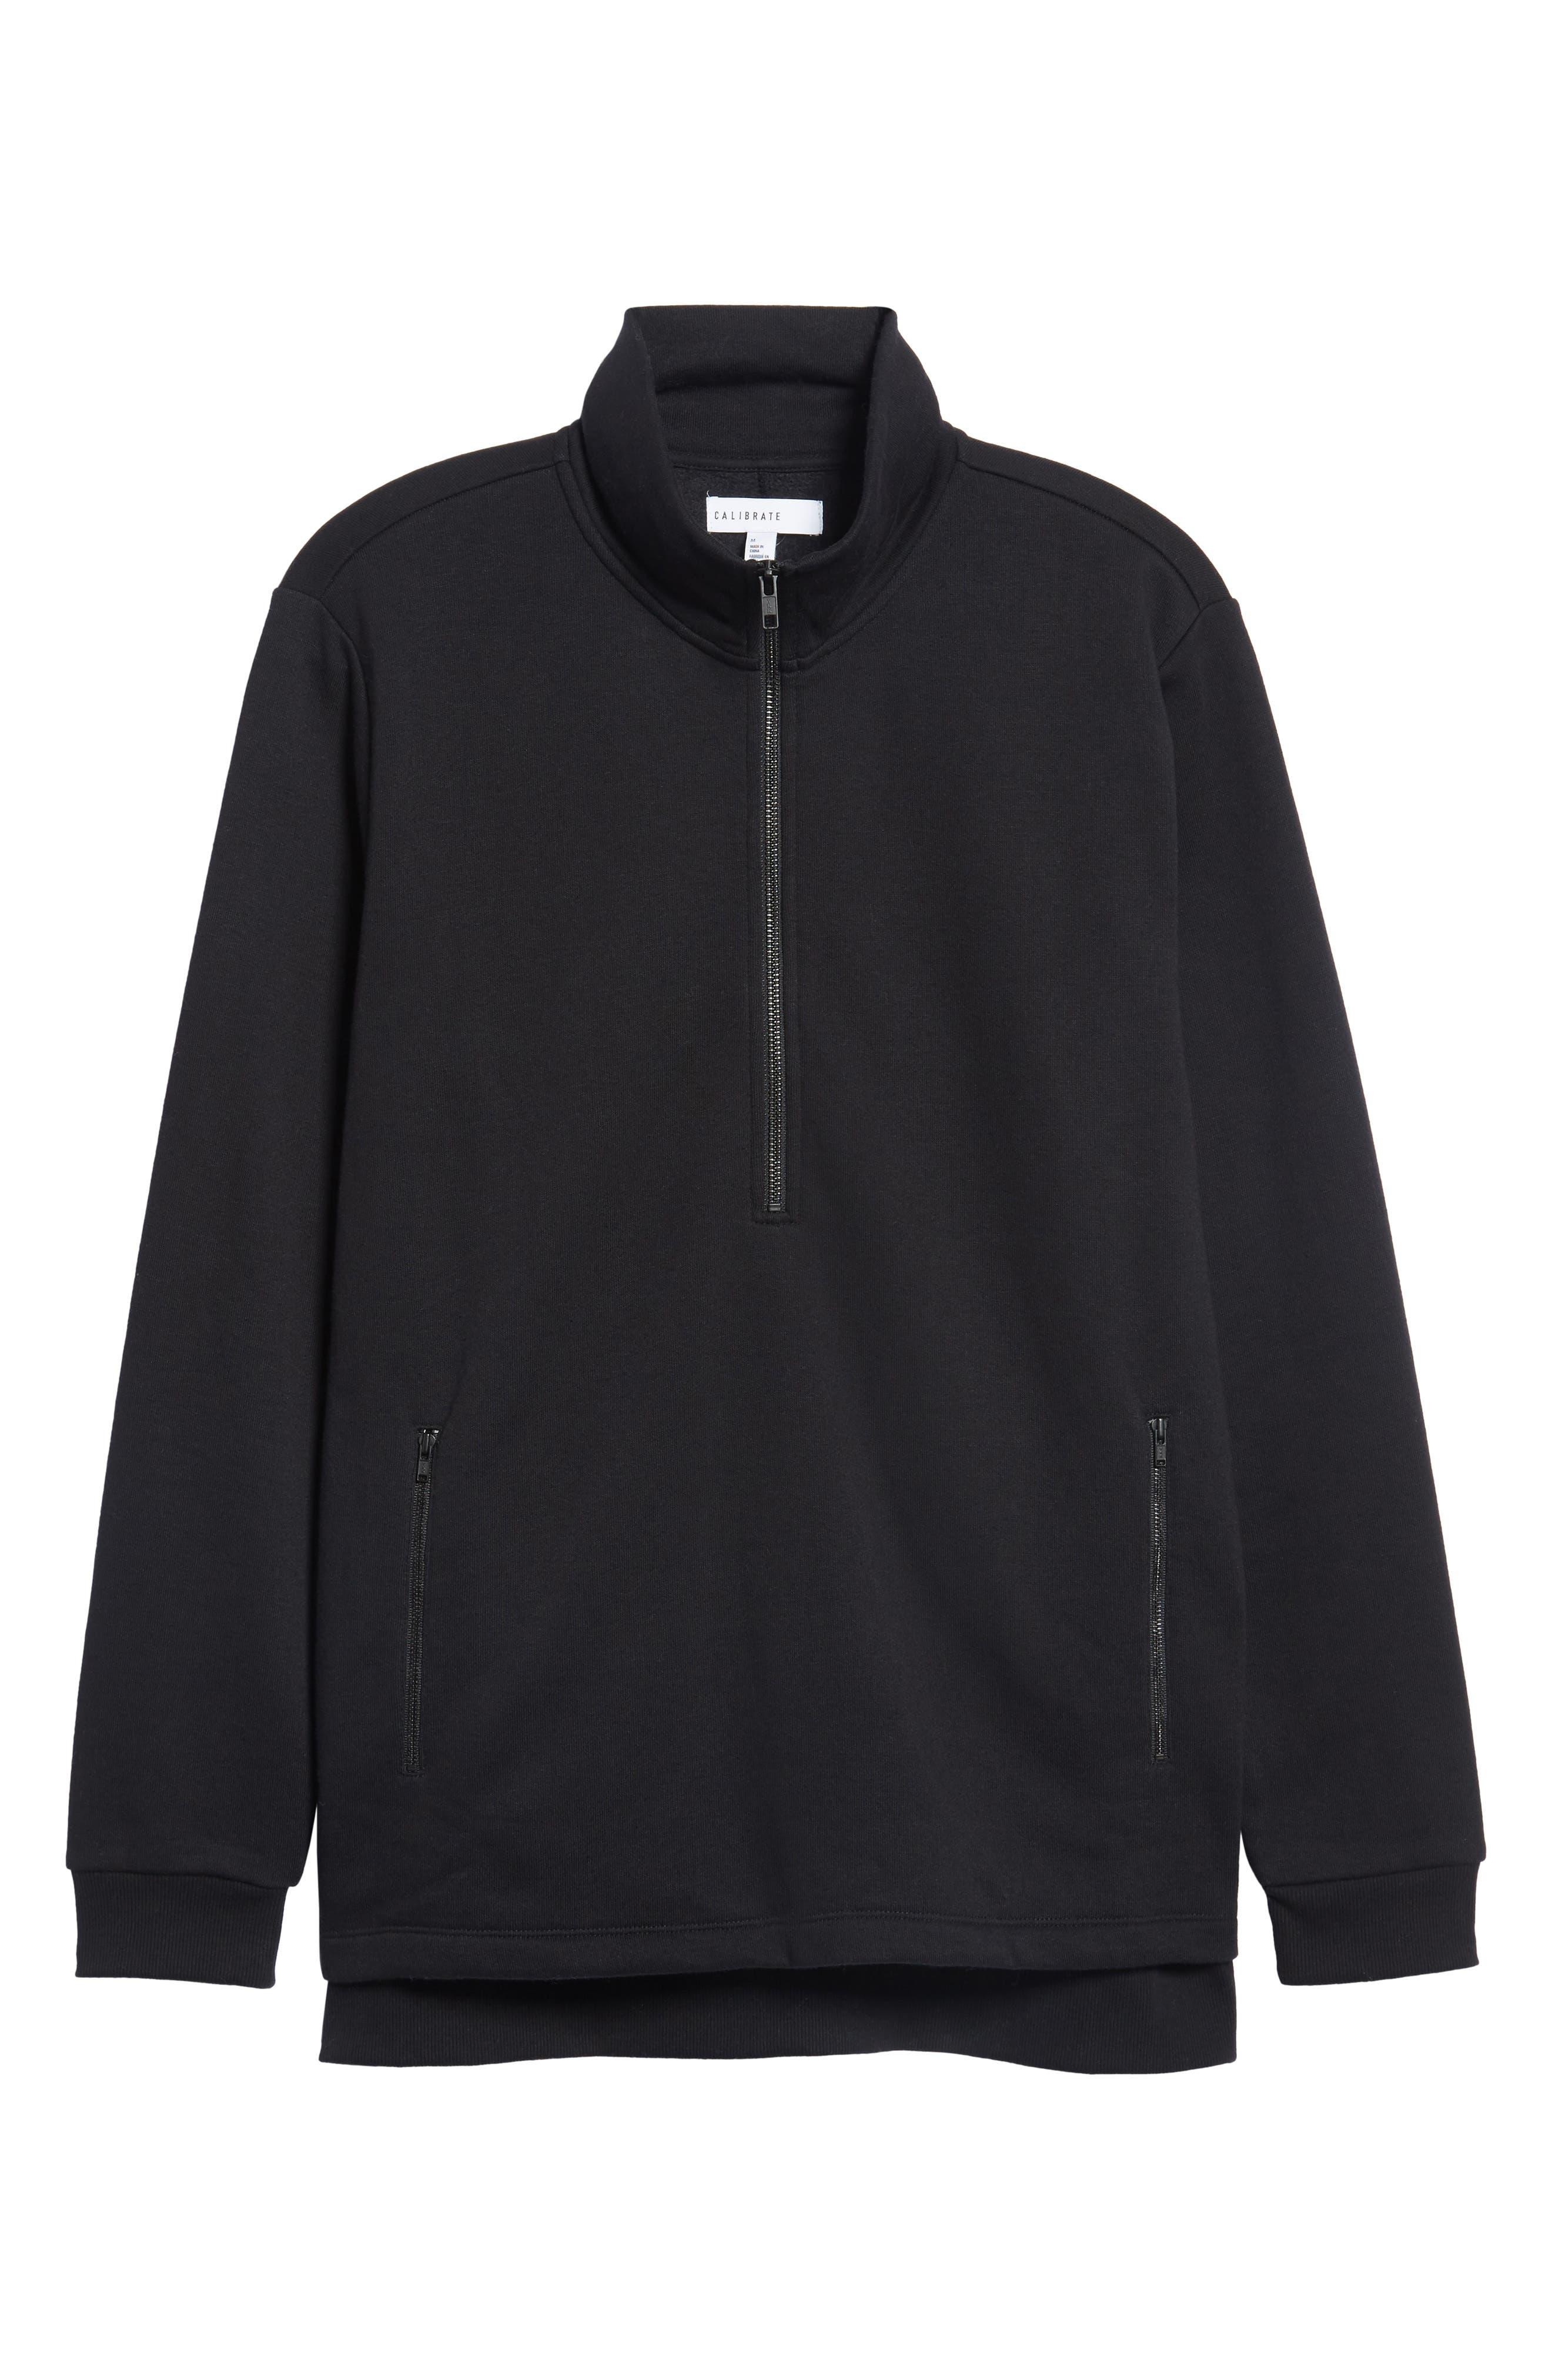 Quarter Zip Fleece Pullover,                             Alternate thumbnail 6, color,                             001